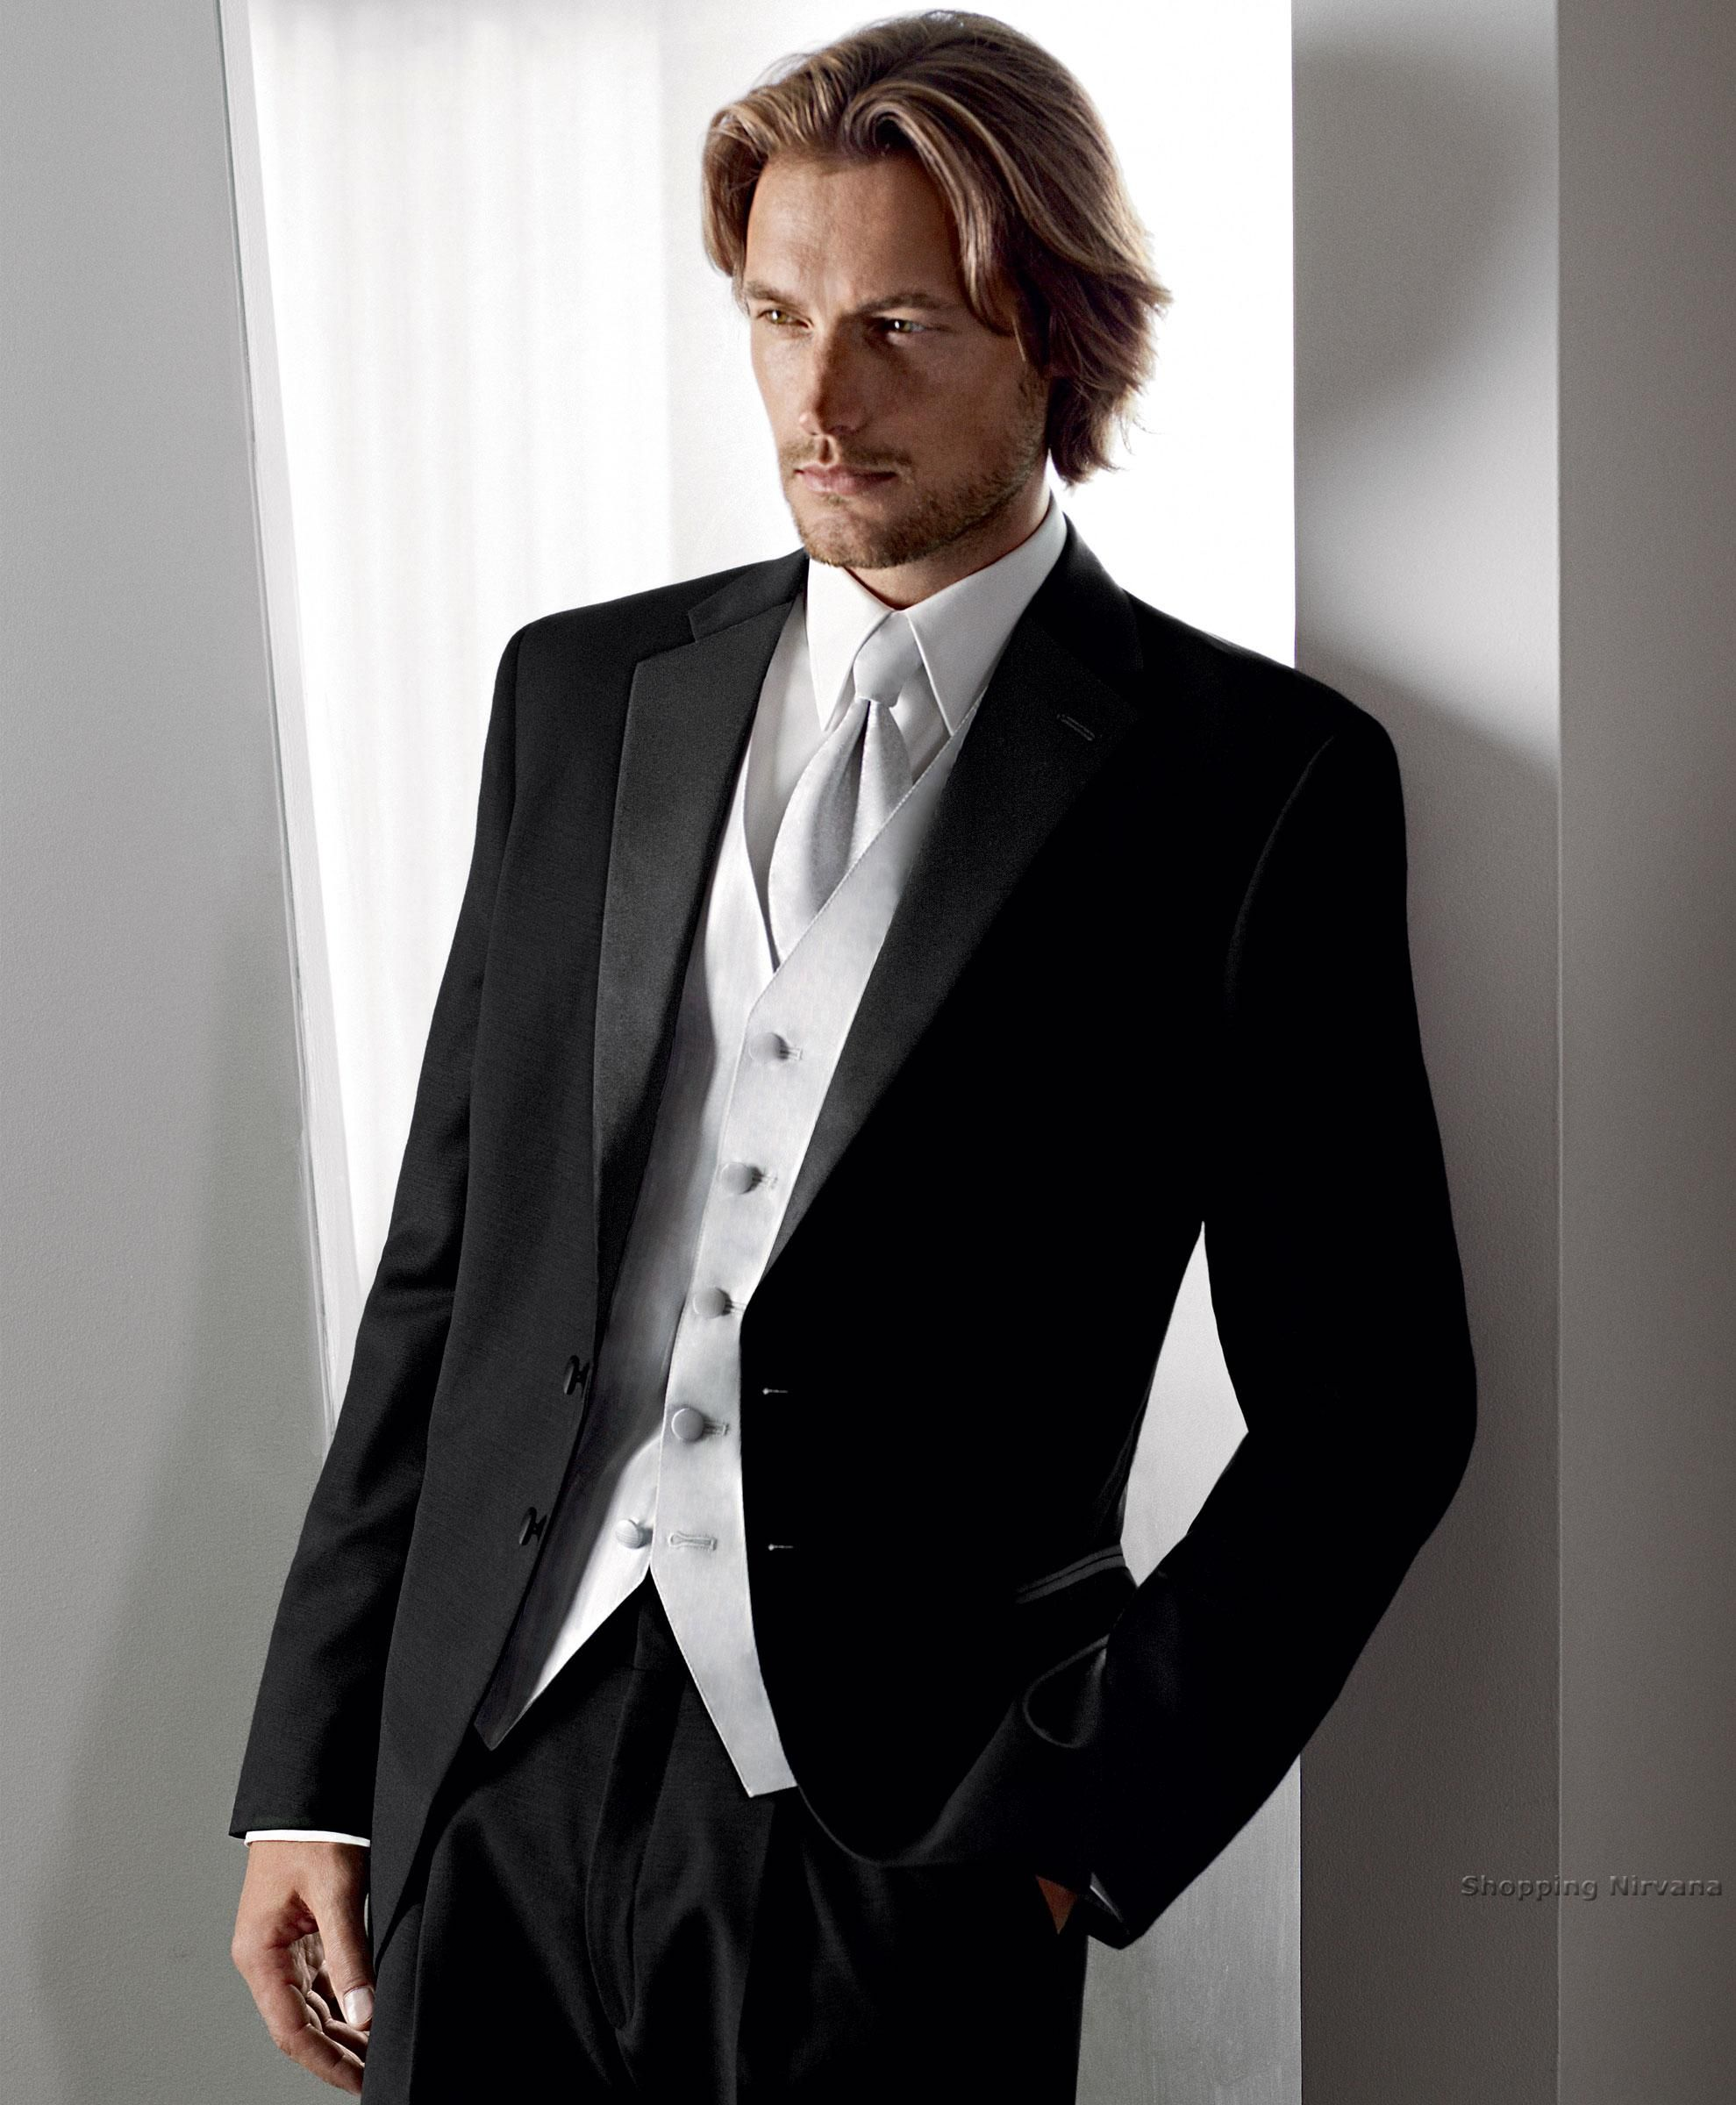 tuxedo chaleco gris mirada profunda   Mariage   Pinterest ...